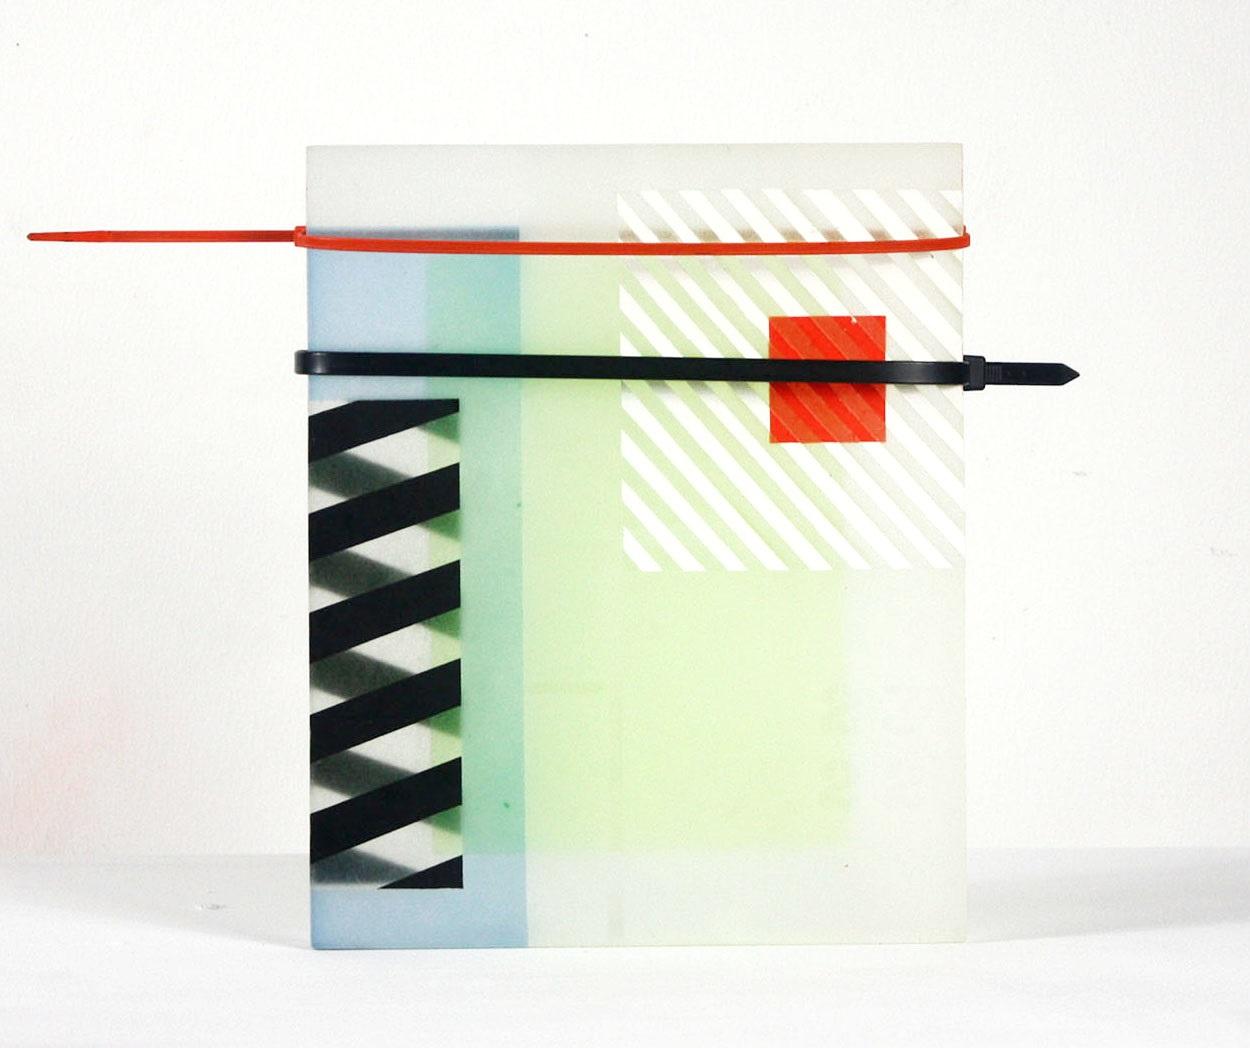 Future Antique  2018  Acrylic Paint, Epoxy Resin, Zip Ties  12 in x 10 in x 1 in